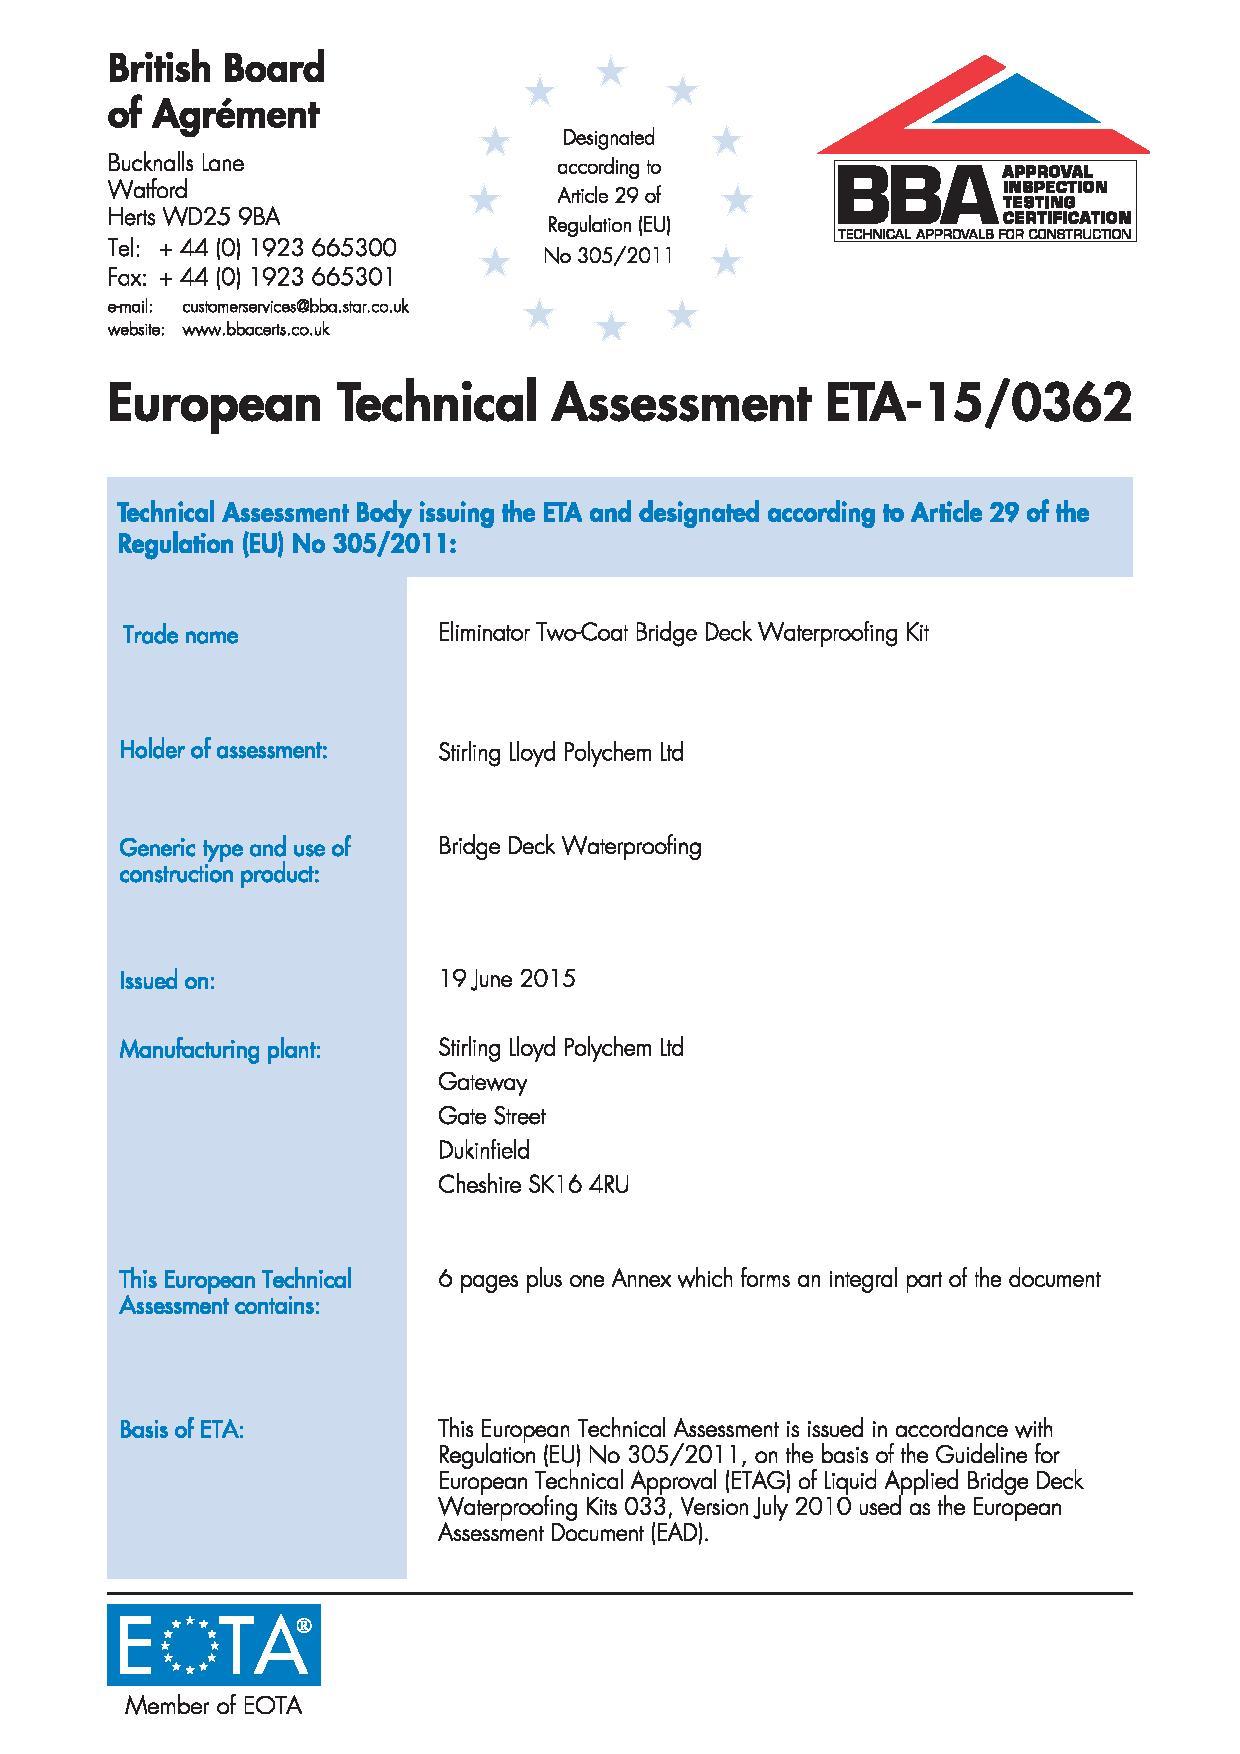 Europejska Ocena Techniczna